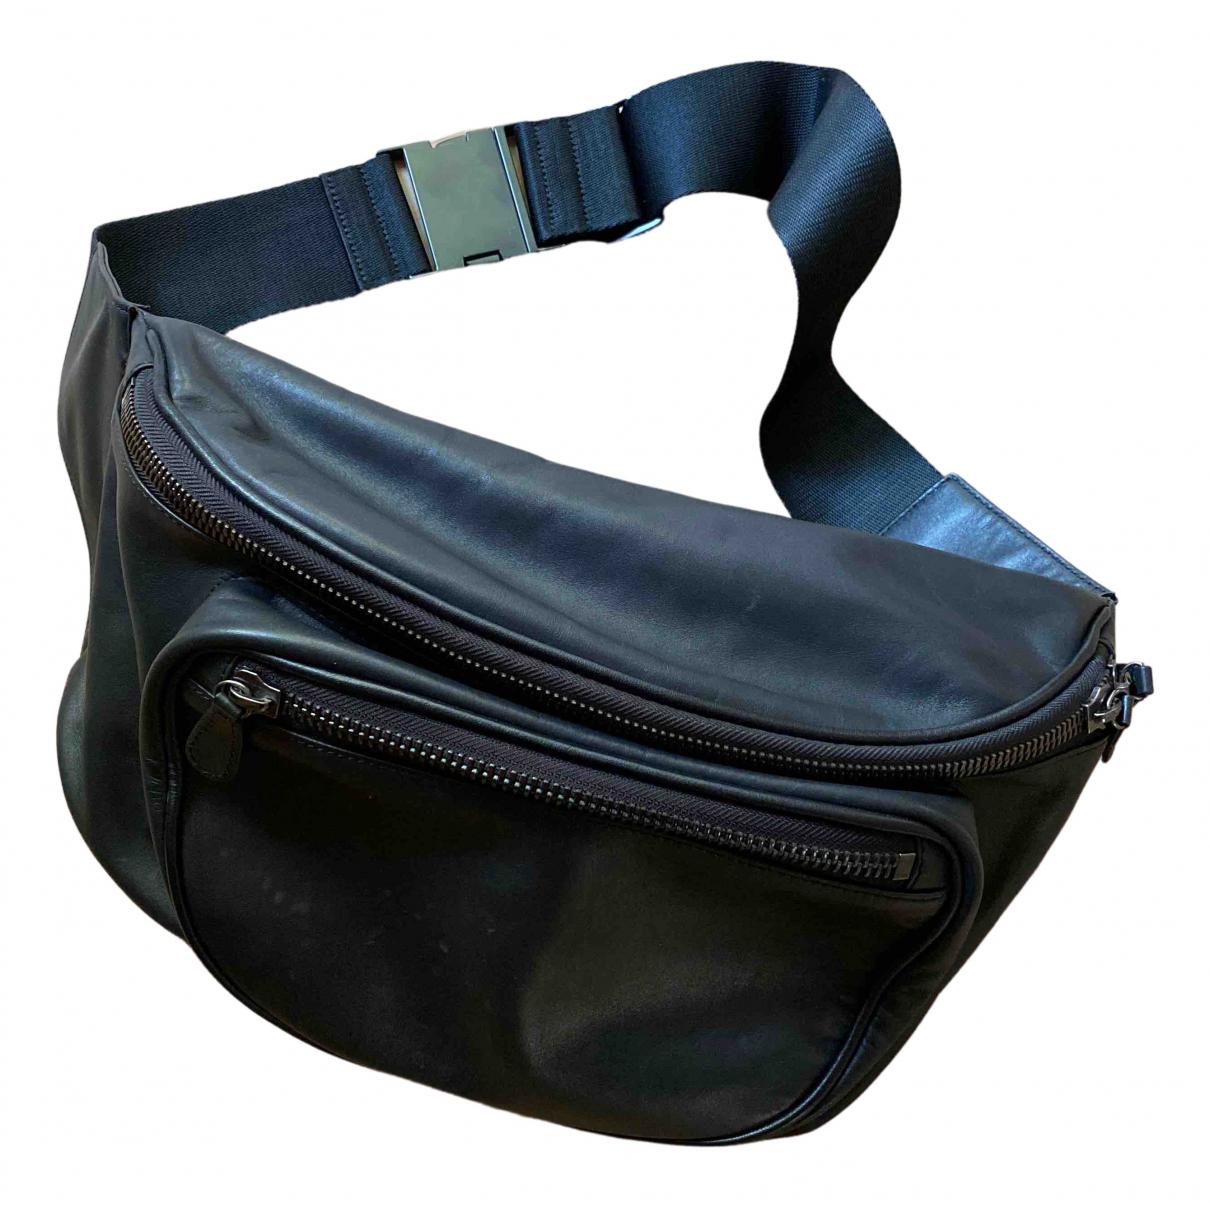 Maison Martin Margiela Pour H&m \N Black Leather backpack for Women \N